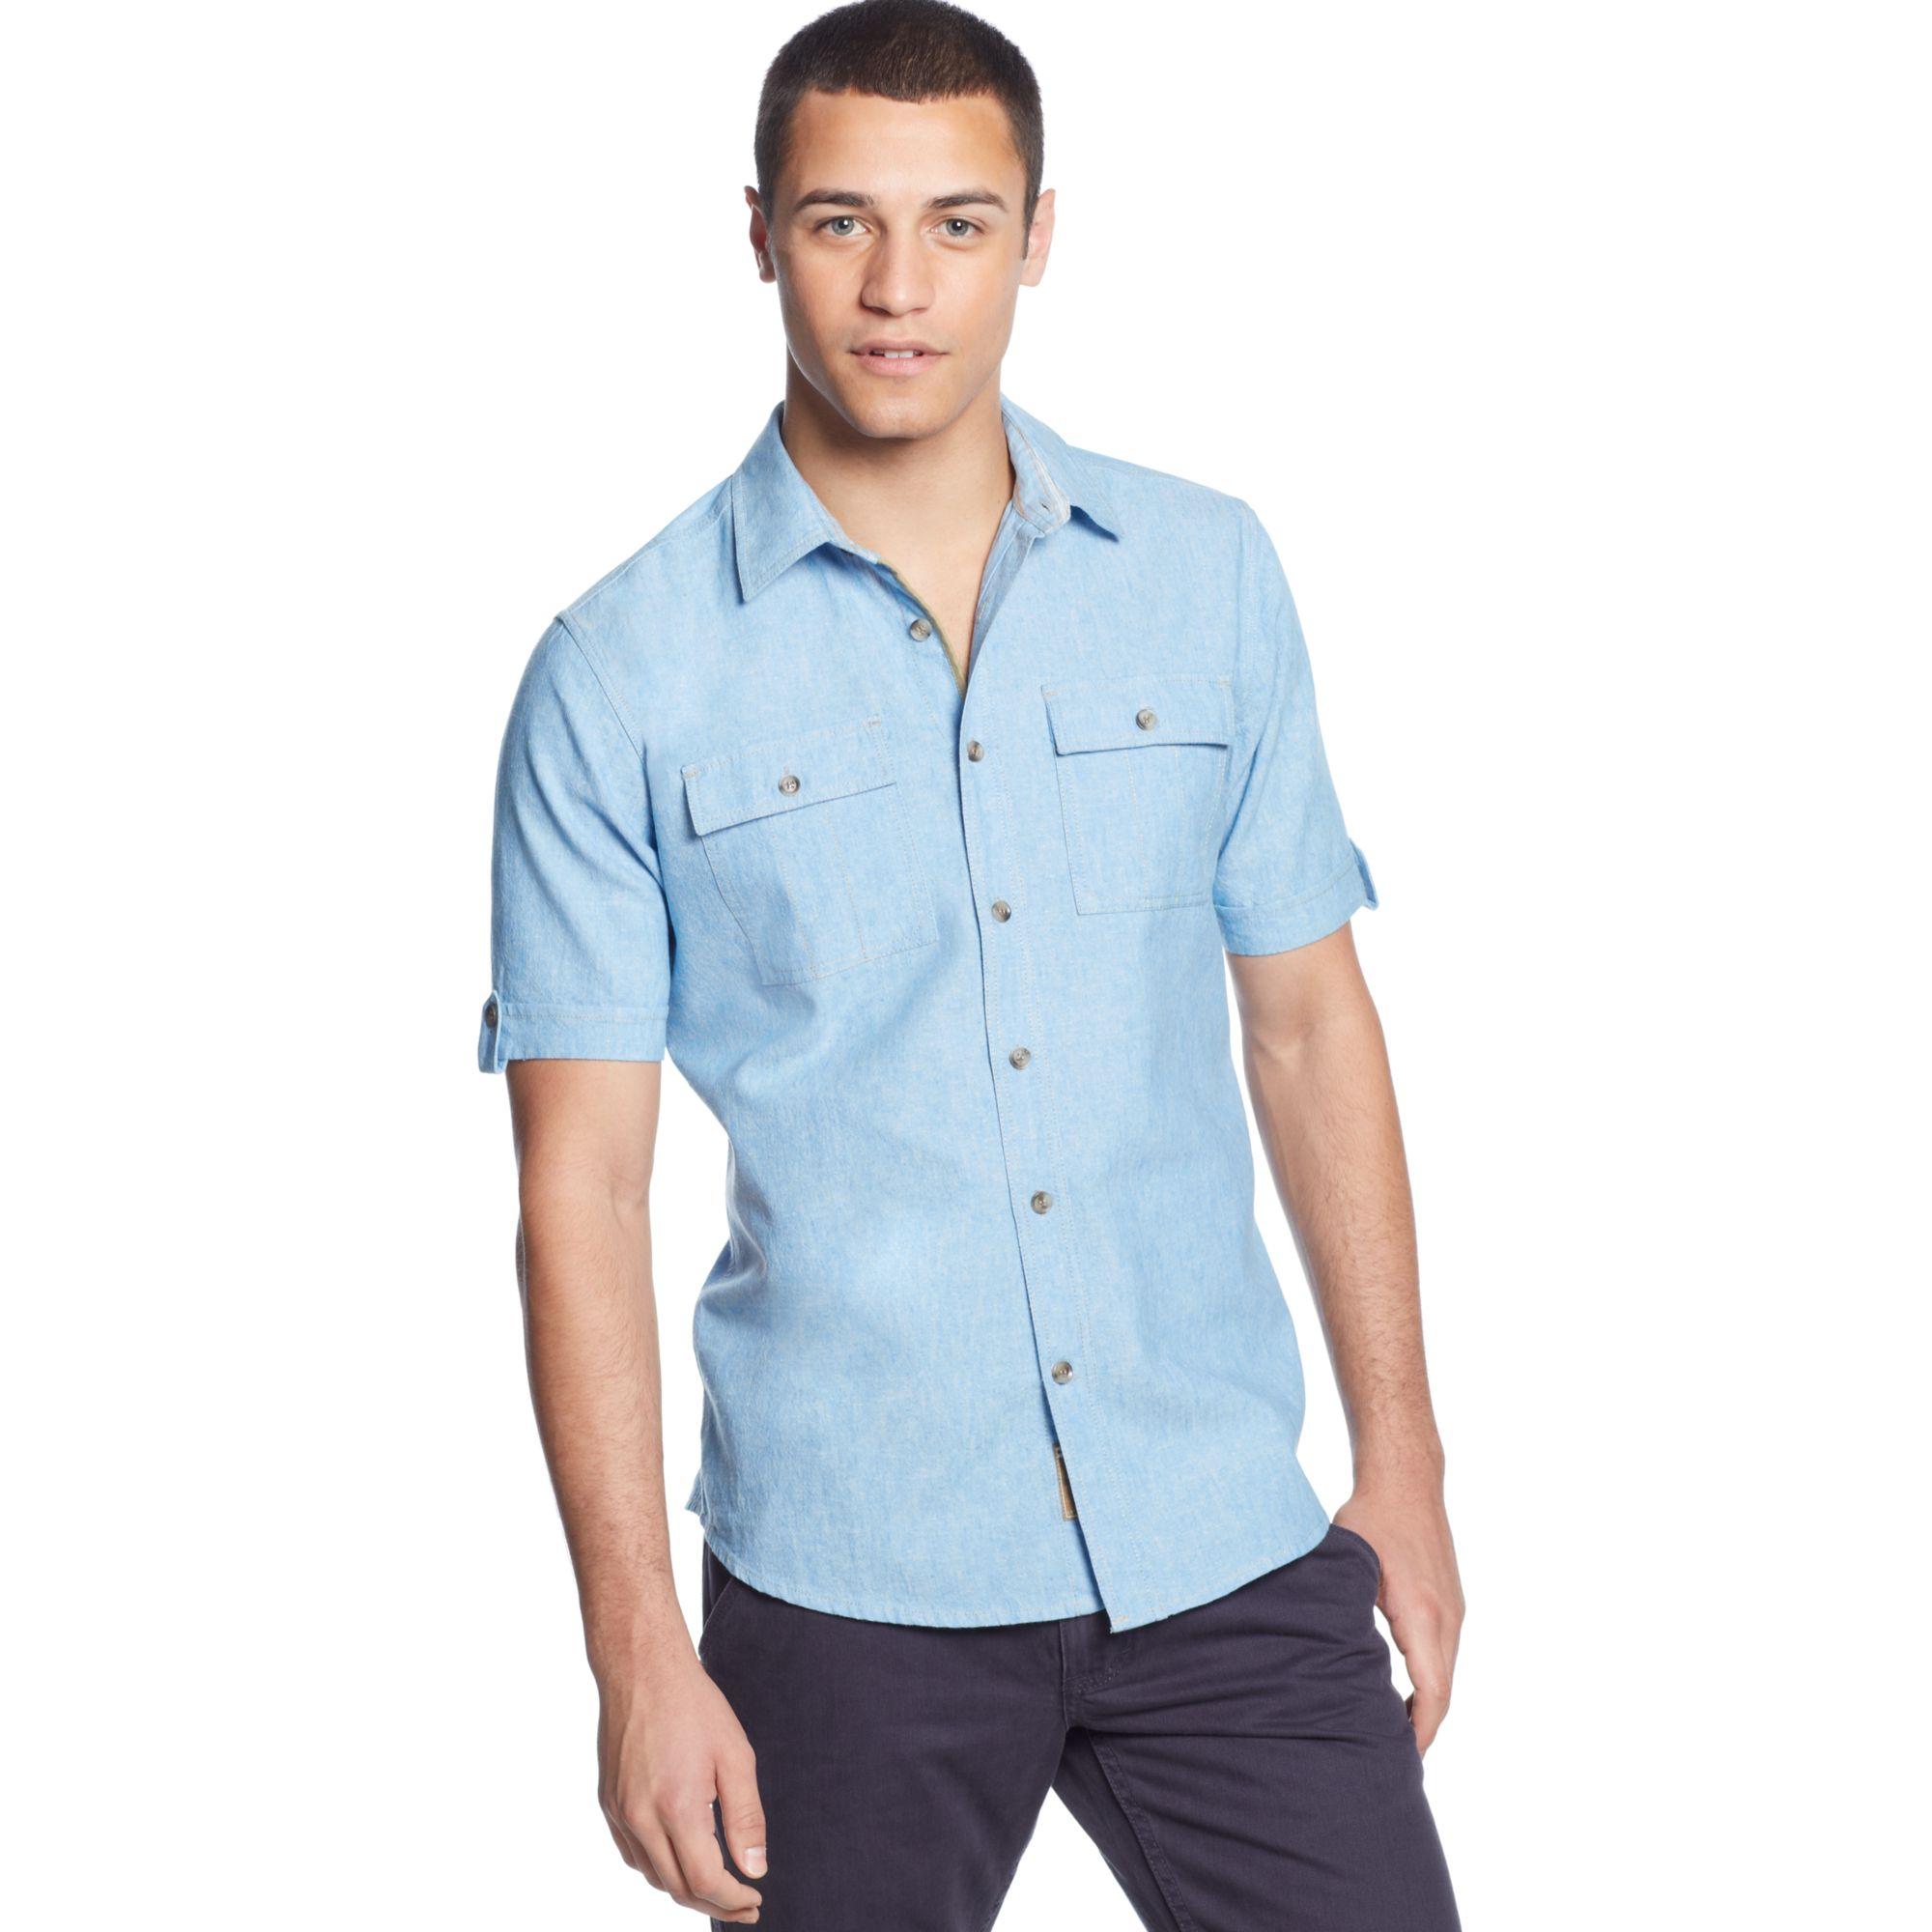 Sean John Shortsleeve Linenblend Shirt in Blue for Men (Azure Blue)